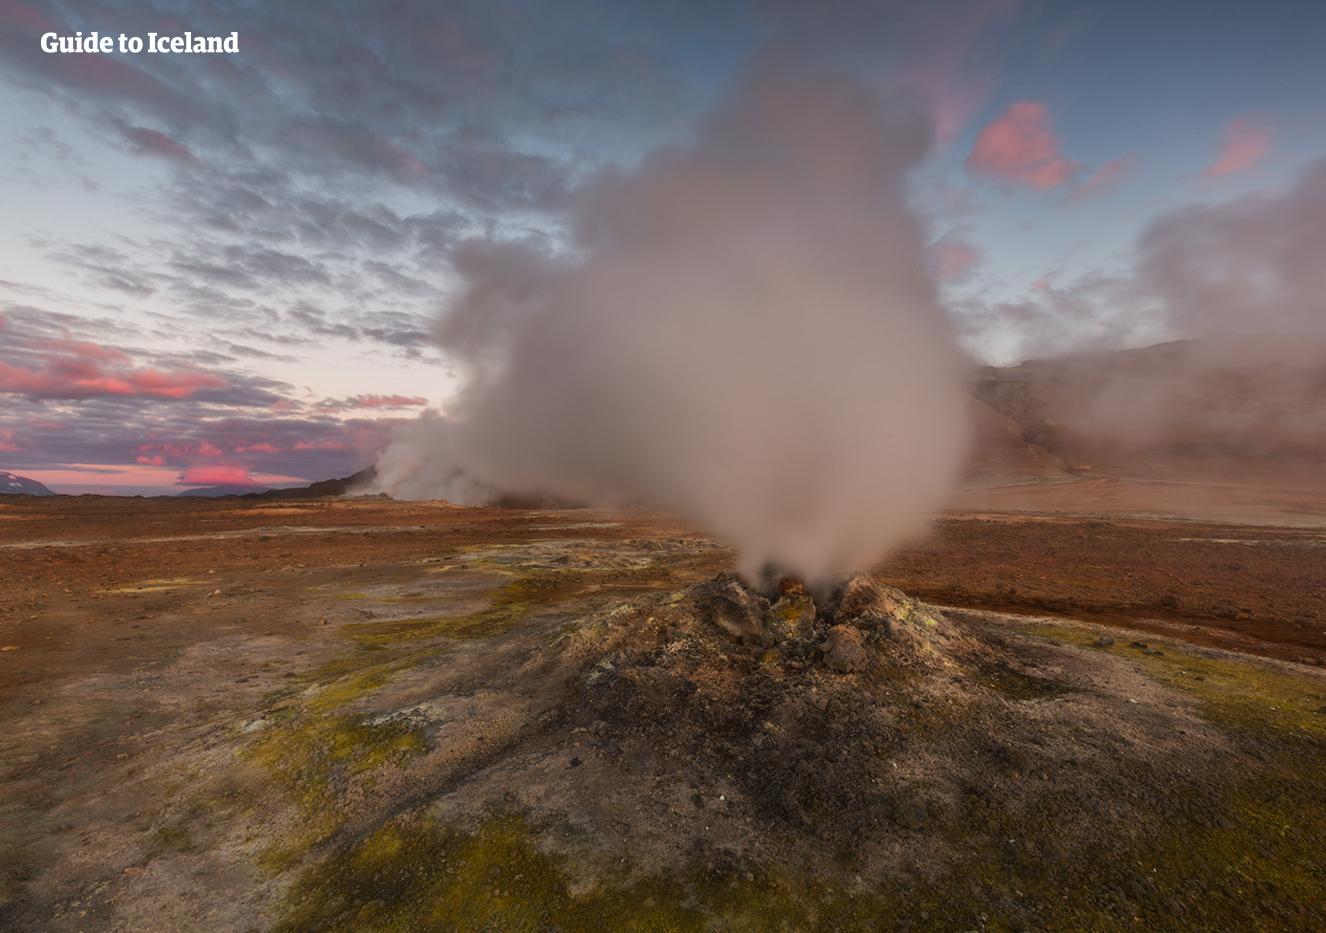 A steaming fumarole at Námaskarð pass near Lake Mývatn.